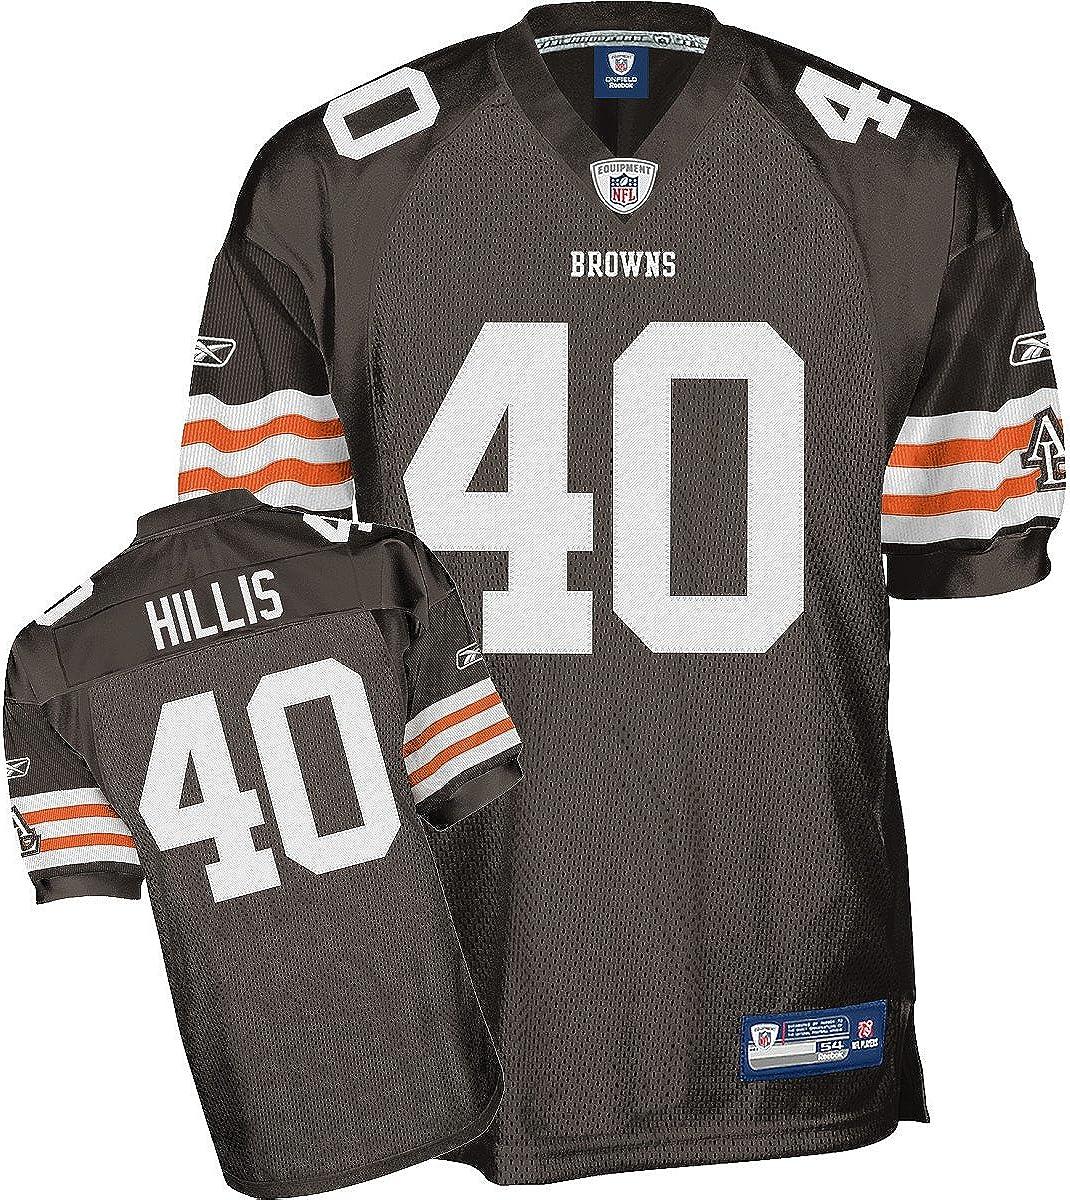 Amazon.com : Reebok Cleveland Browns Peyton Hillis Authentic ...